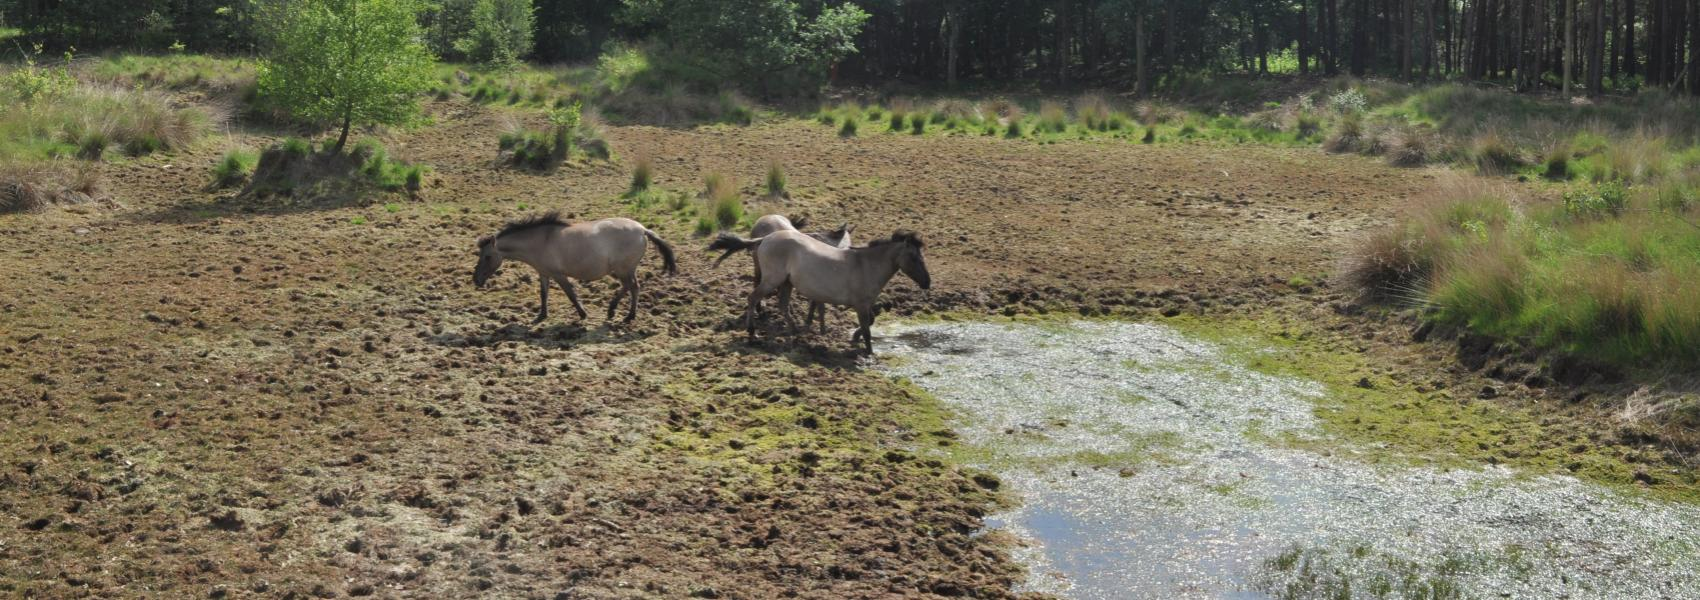 Konikpaarden in de Abtsheide